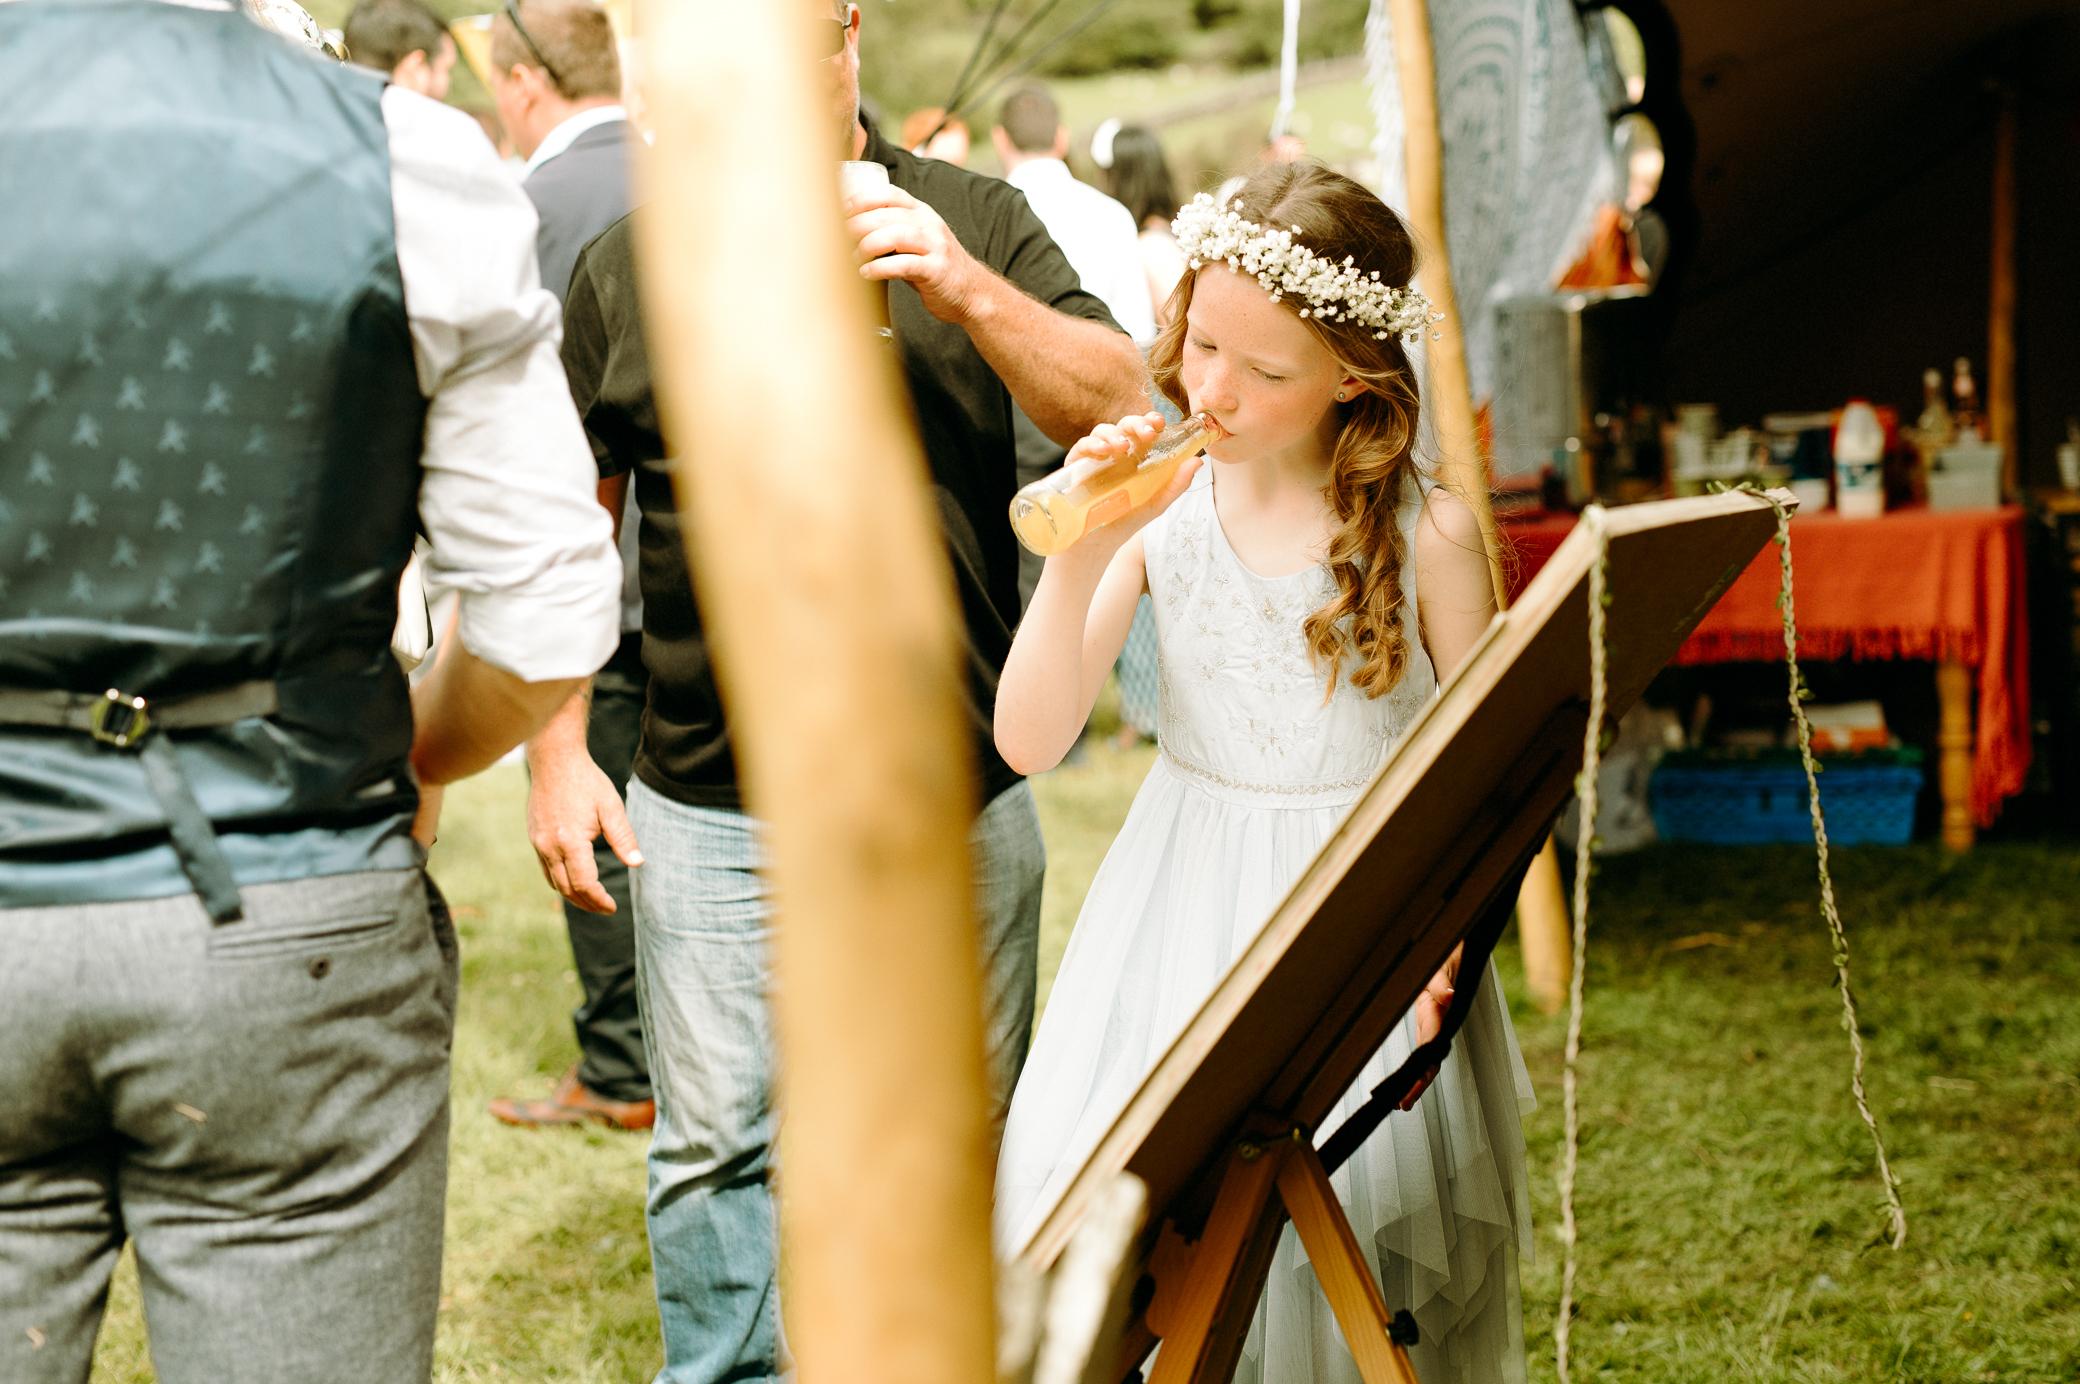 Carmel&Marcus_Wedding photographer Europe-67.jpg